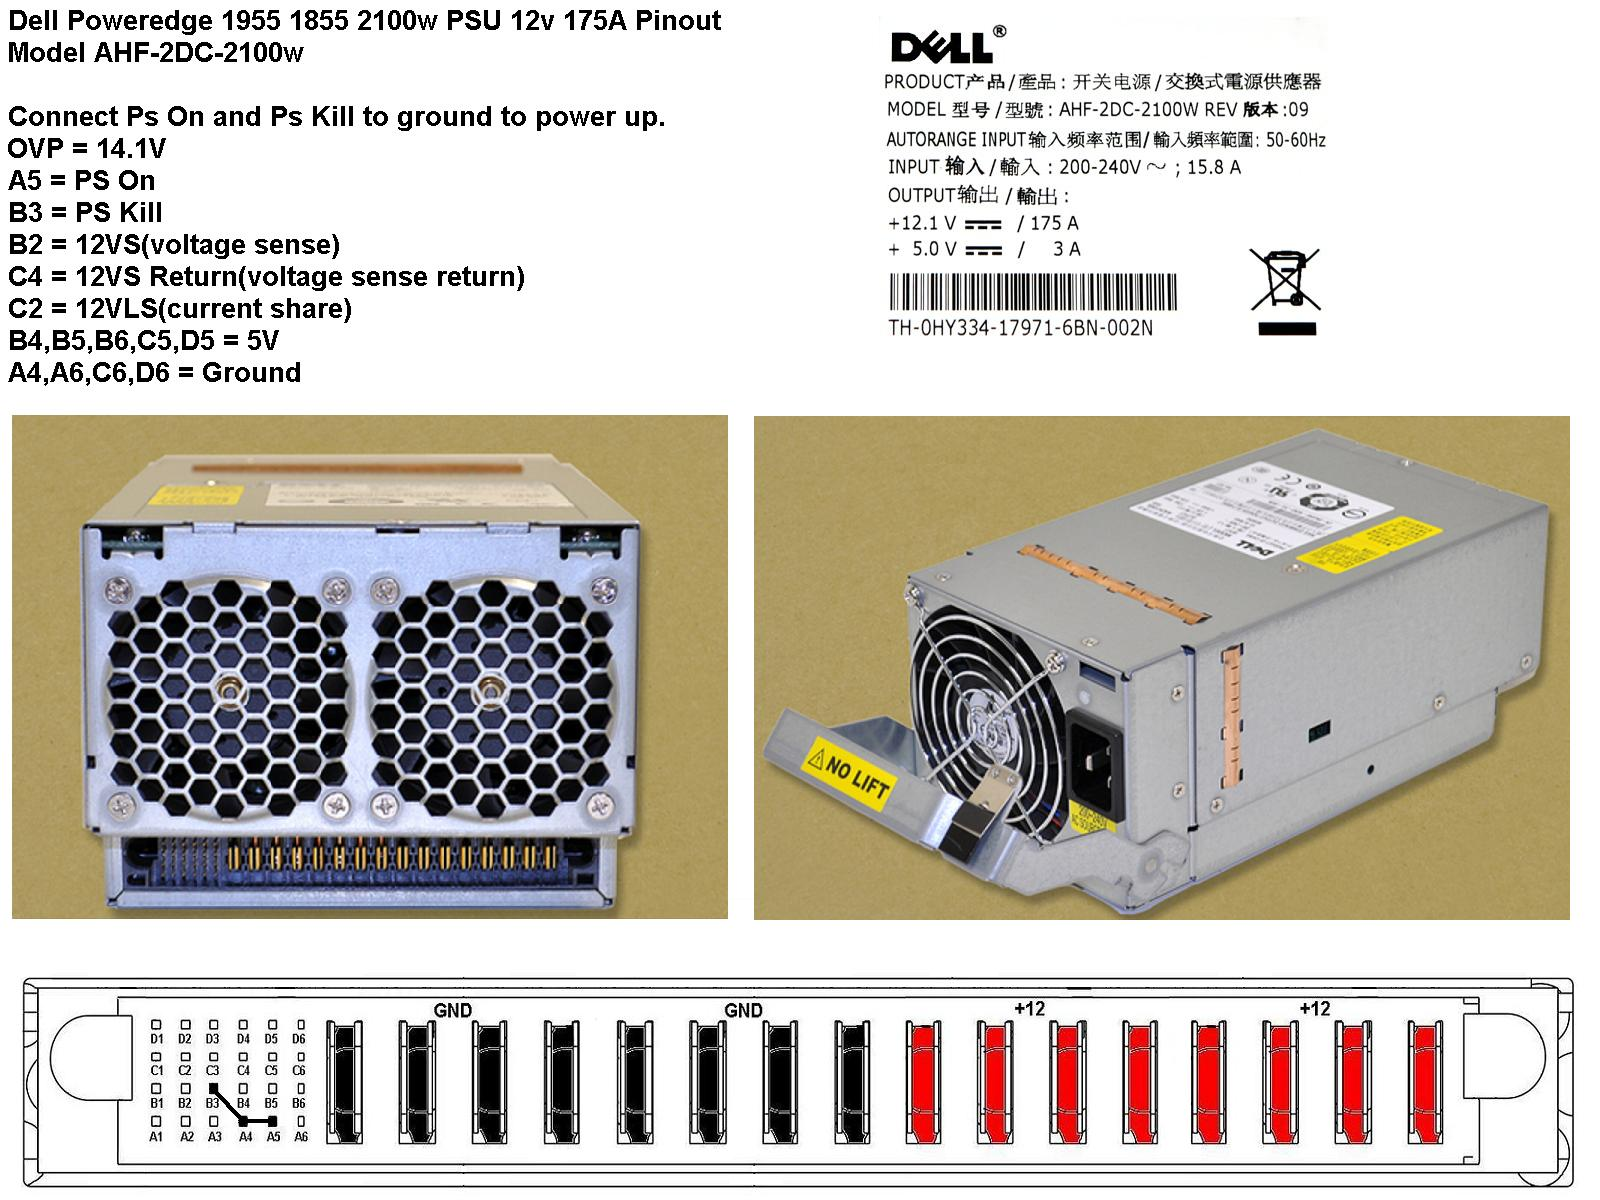 Server PSU - Dell Poweredge 1855 1955 PSU AHF-2DC NT750 2100W